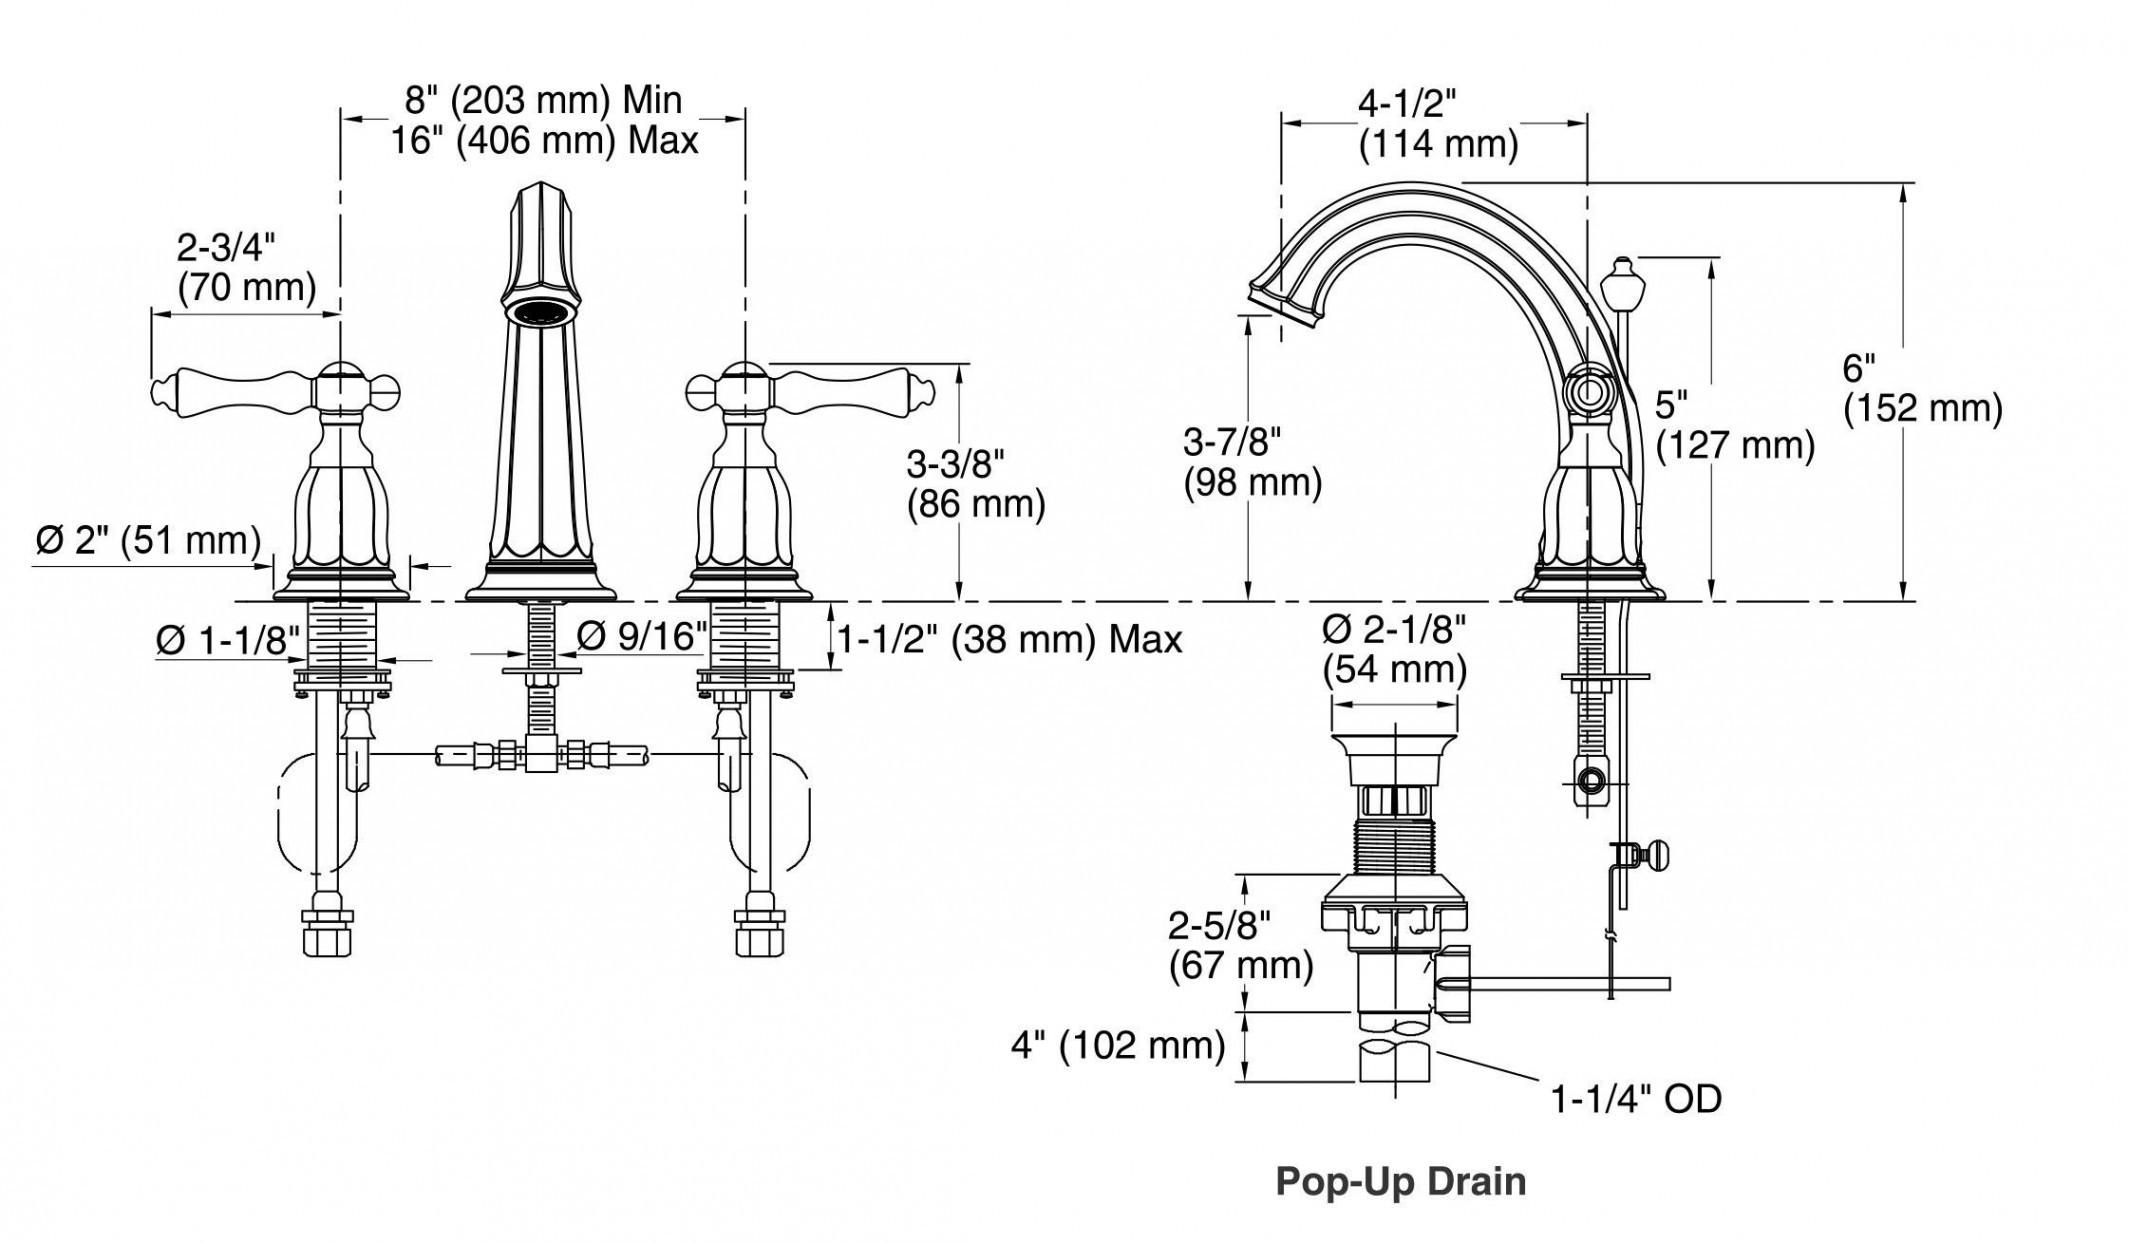 Delta Faucet Repair Parts Diagram Graceful Moen Kitchen Faucet Repair Parts at Faucet Moen Single Of Delta Faucet Repair Parts Diagram